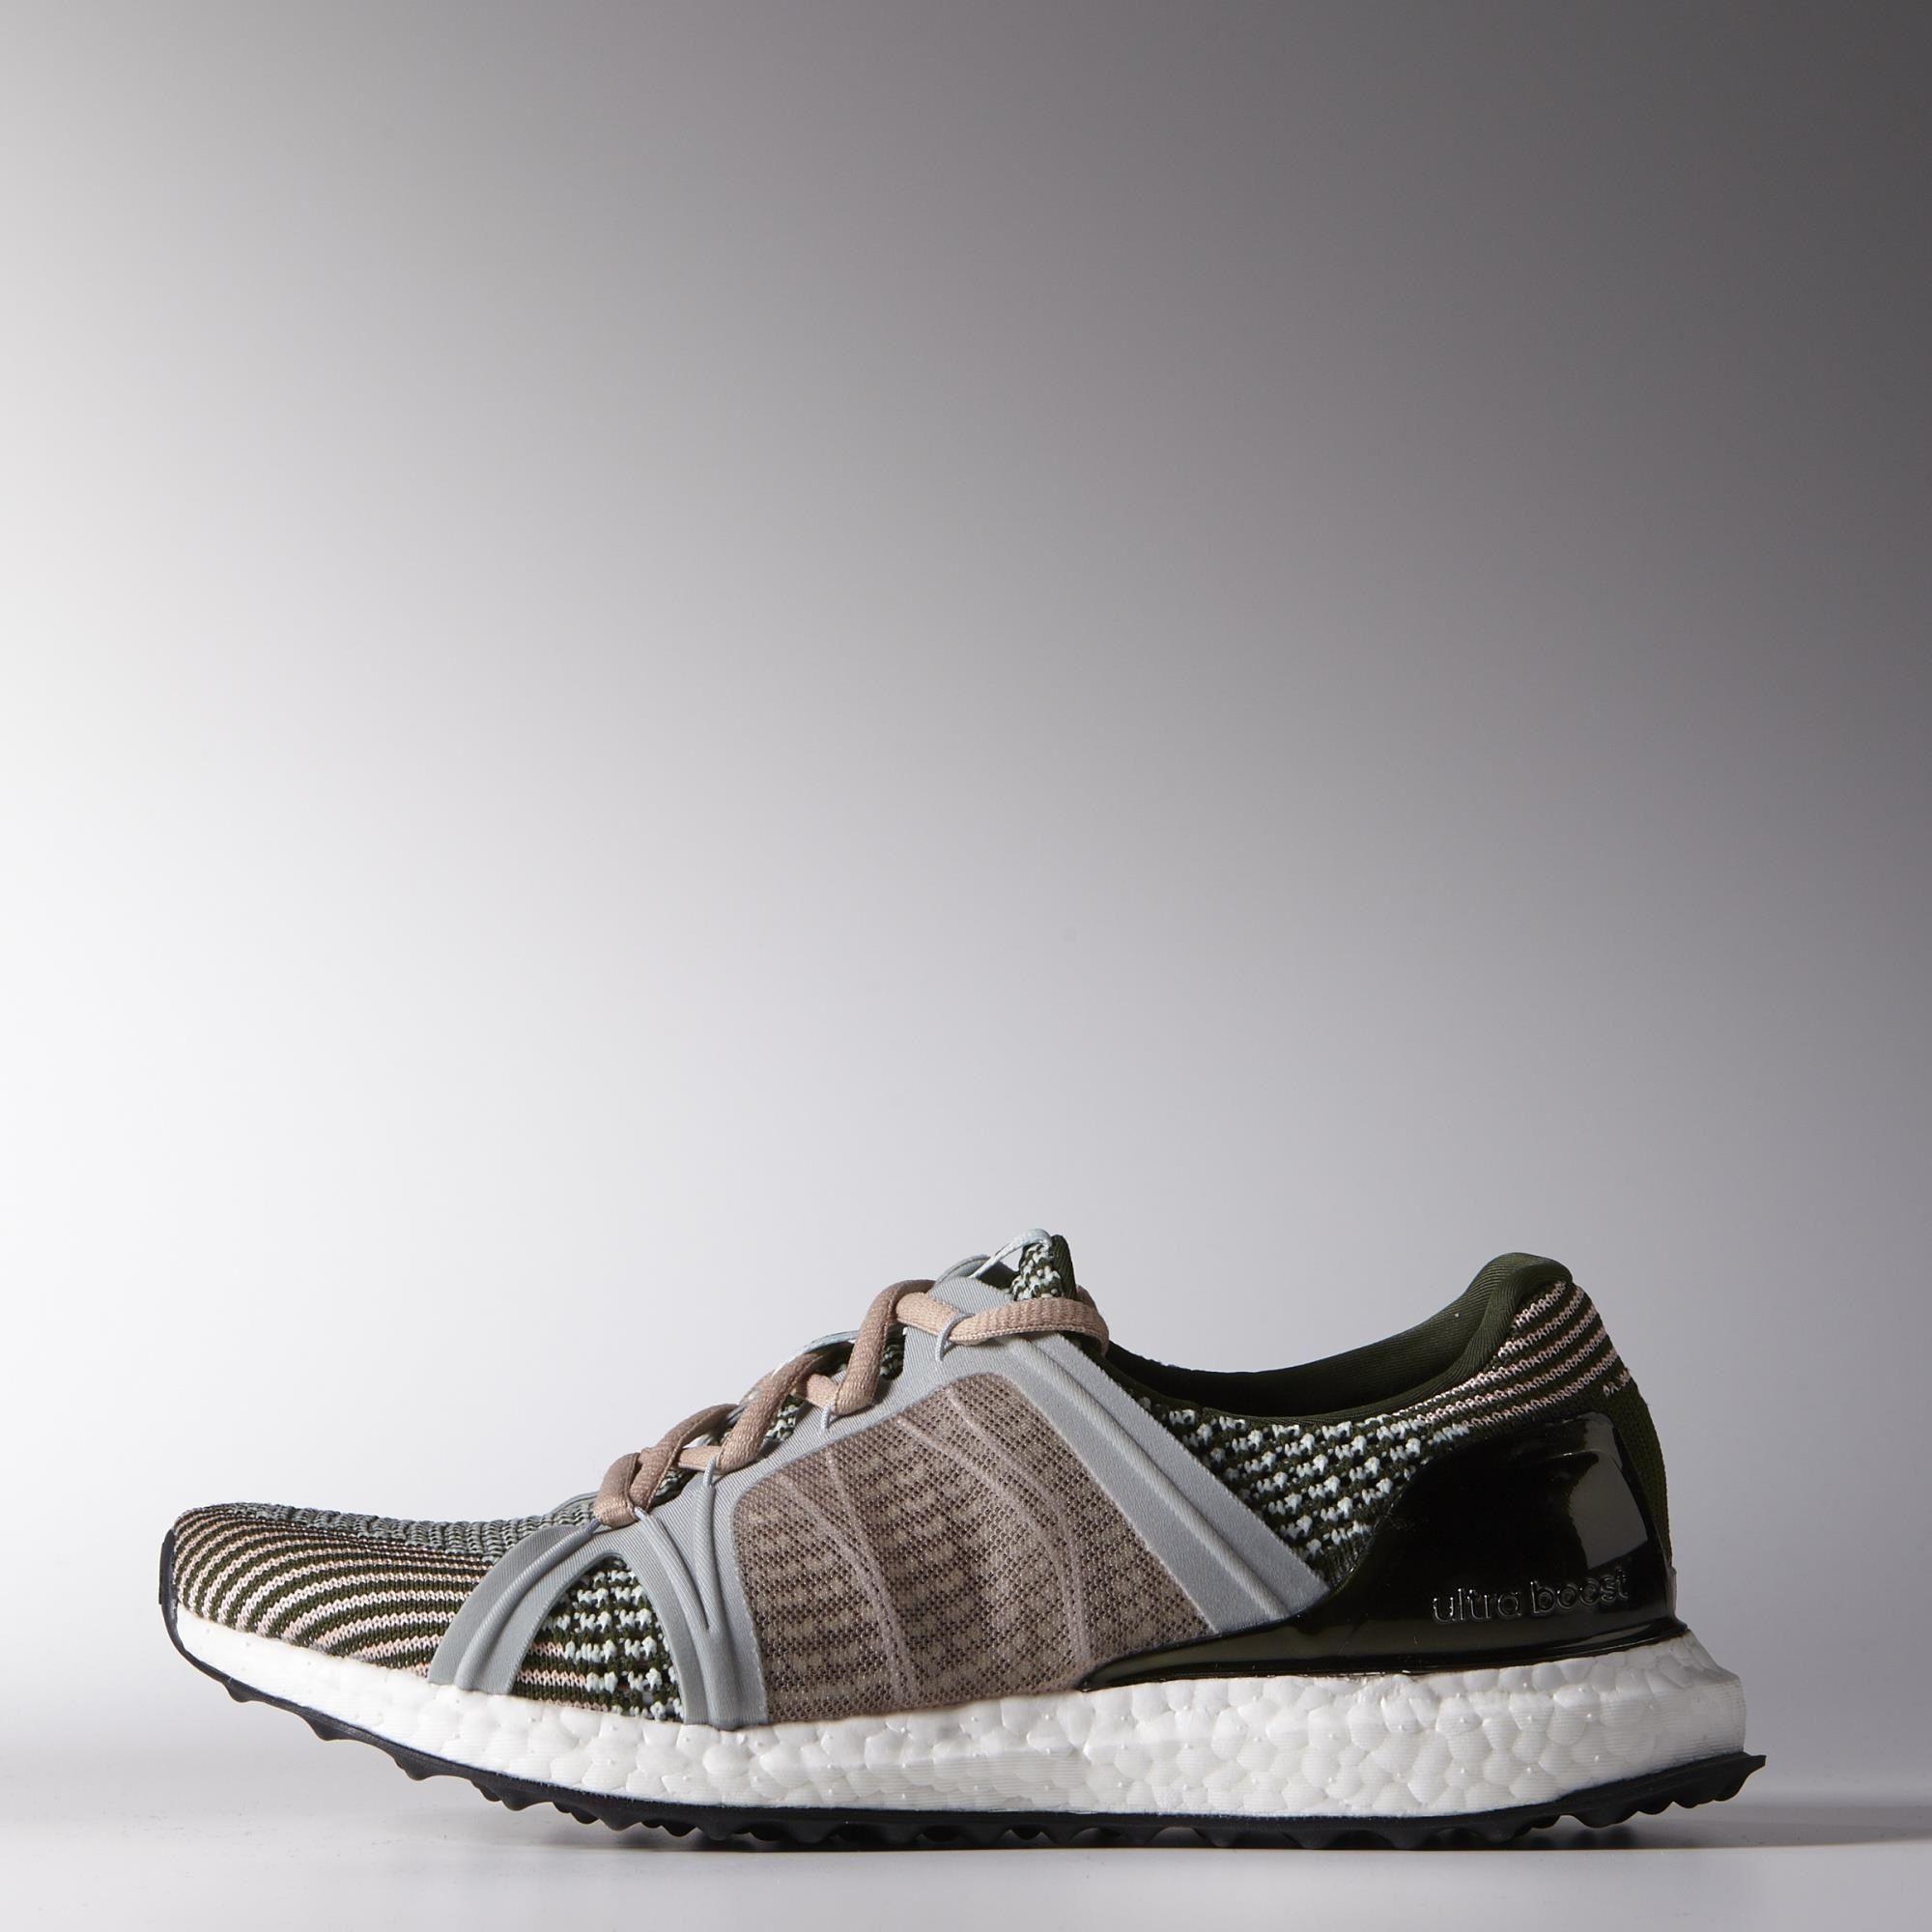 adidas womens ultra boost running shoe by stella mccartney